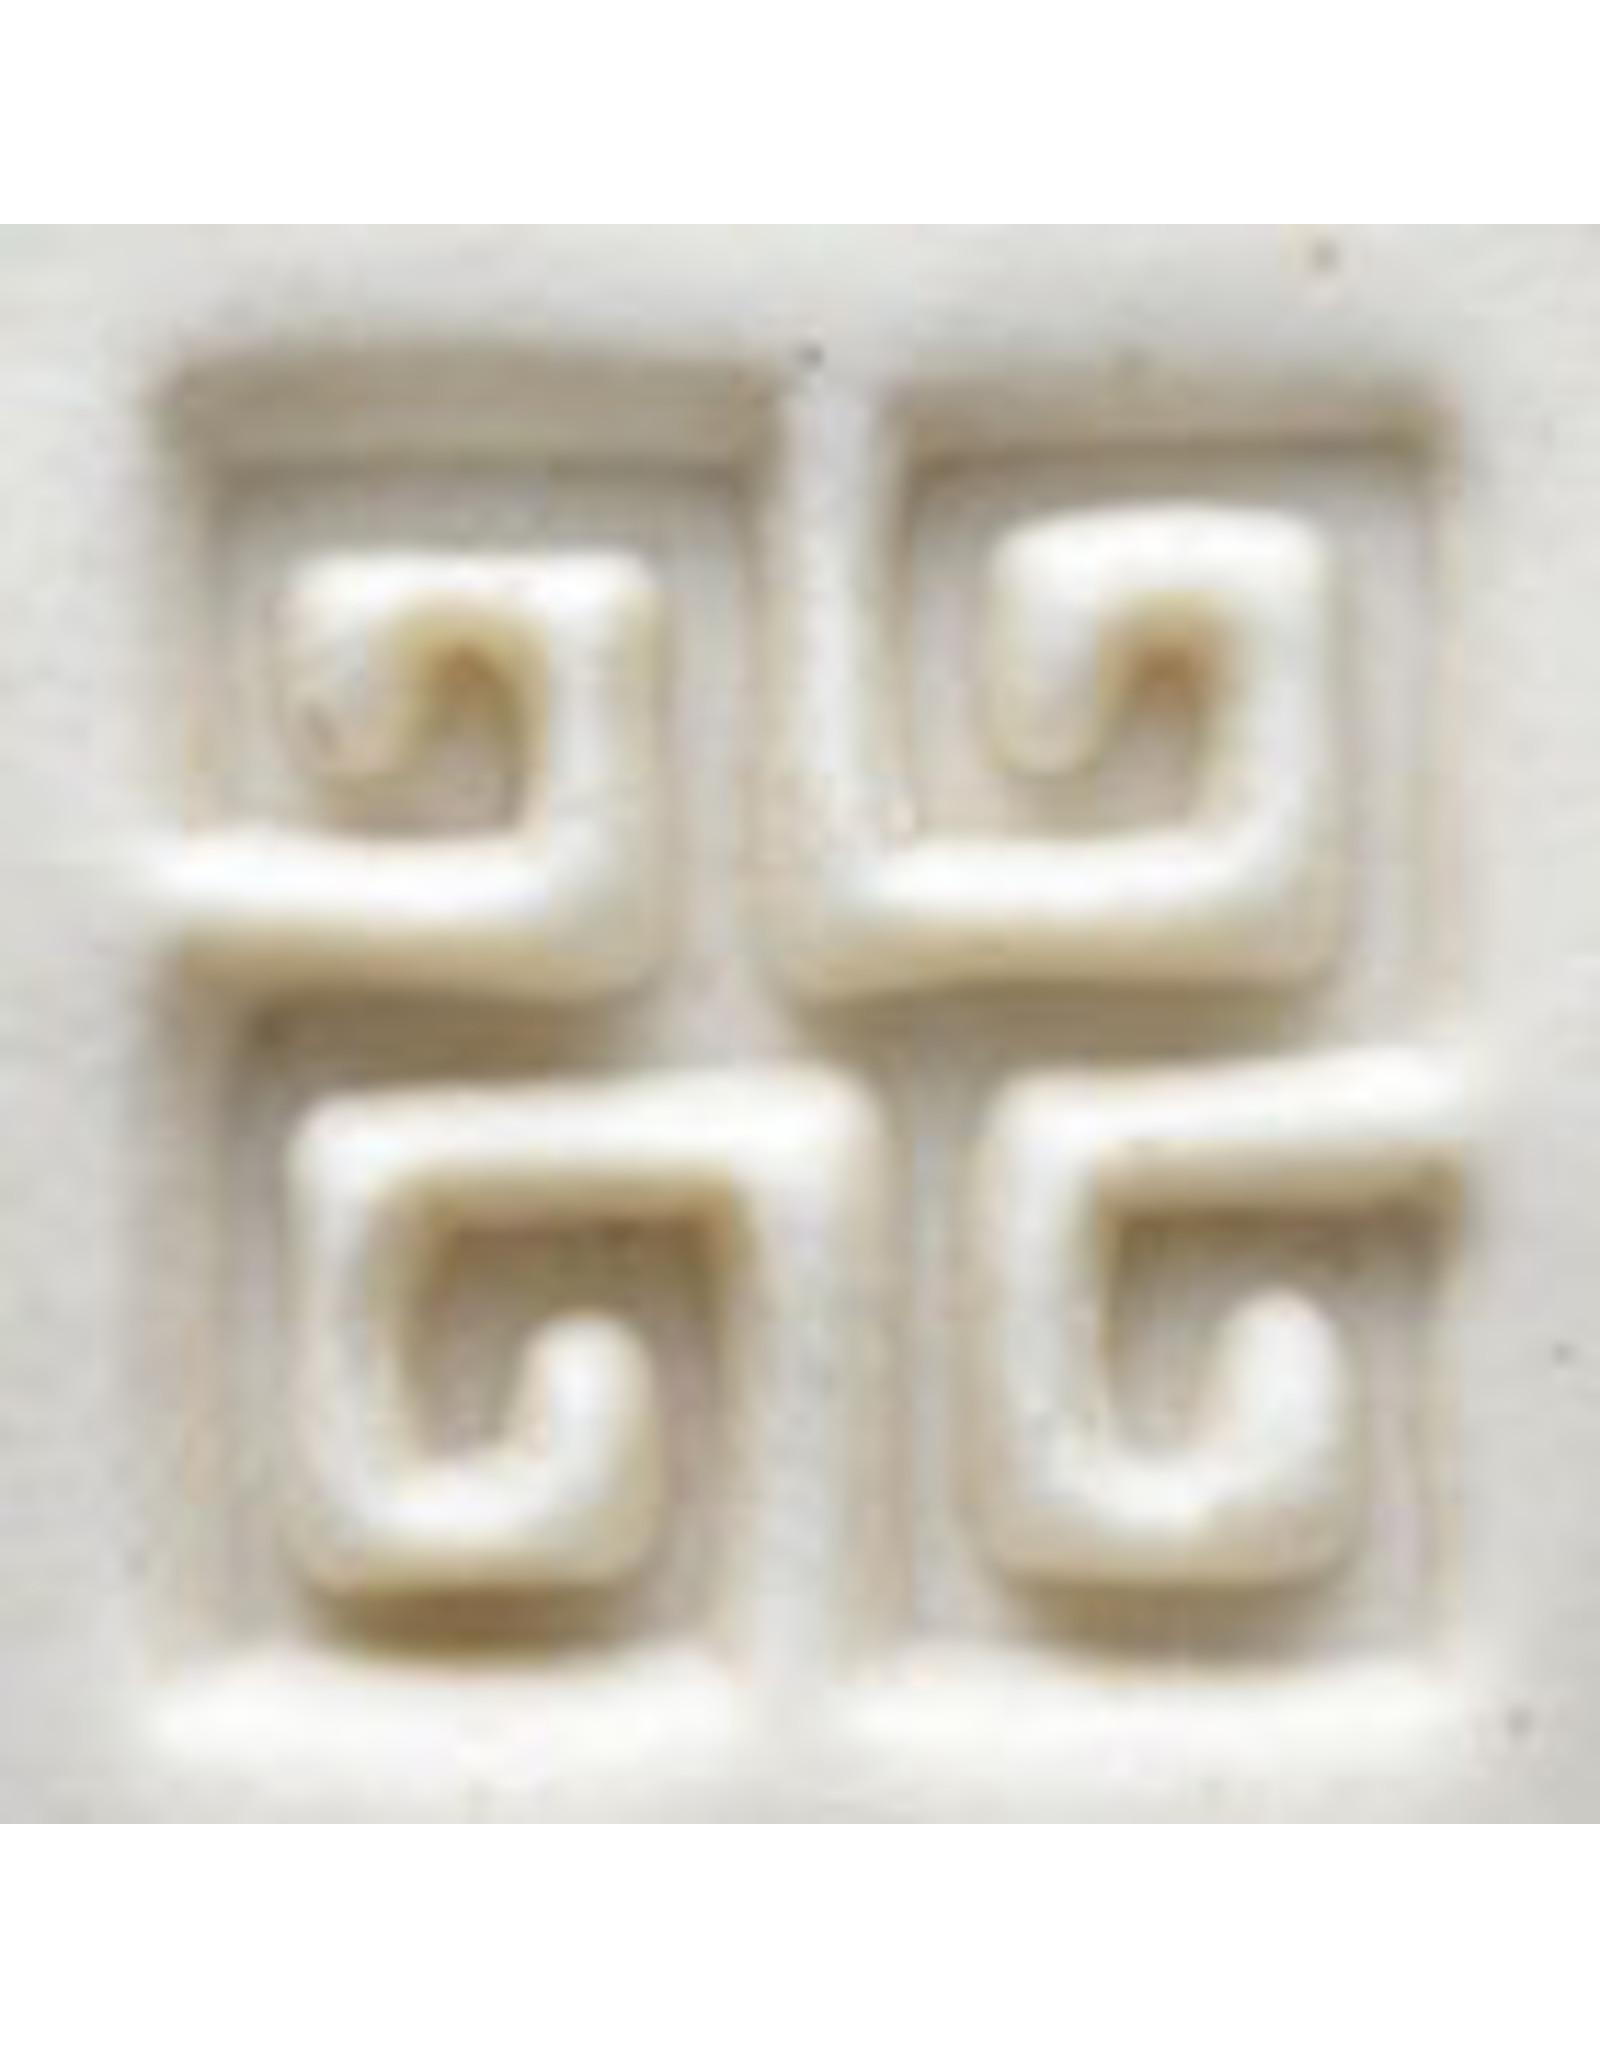 Four Square Pattern Stamp - 2.5cm